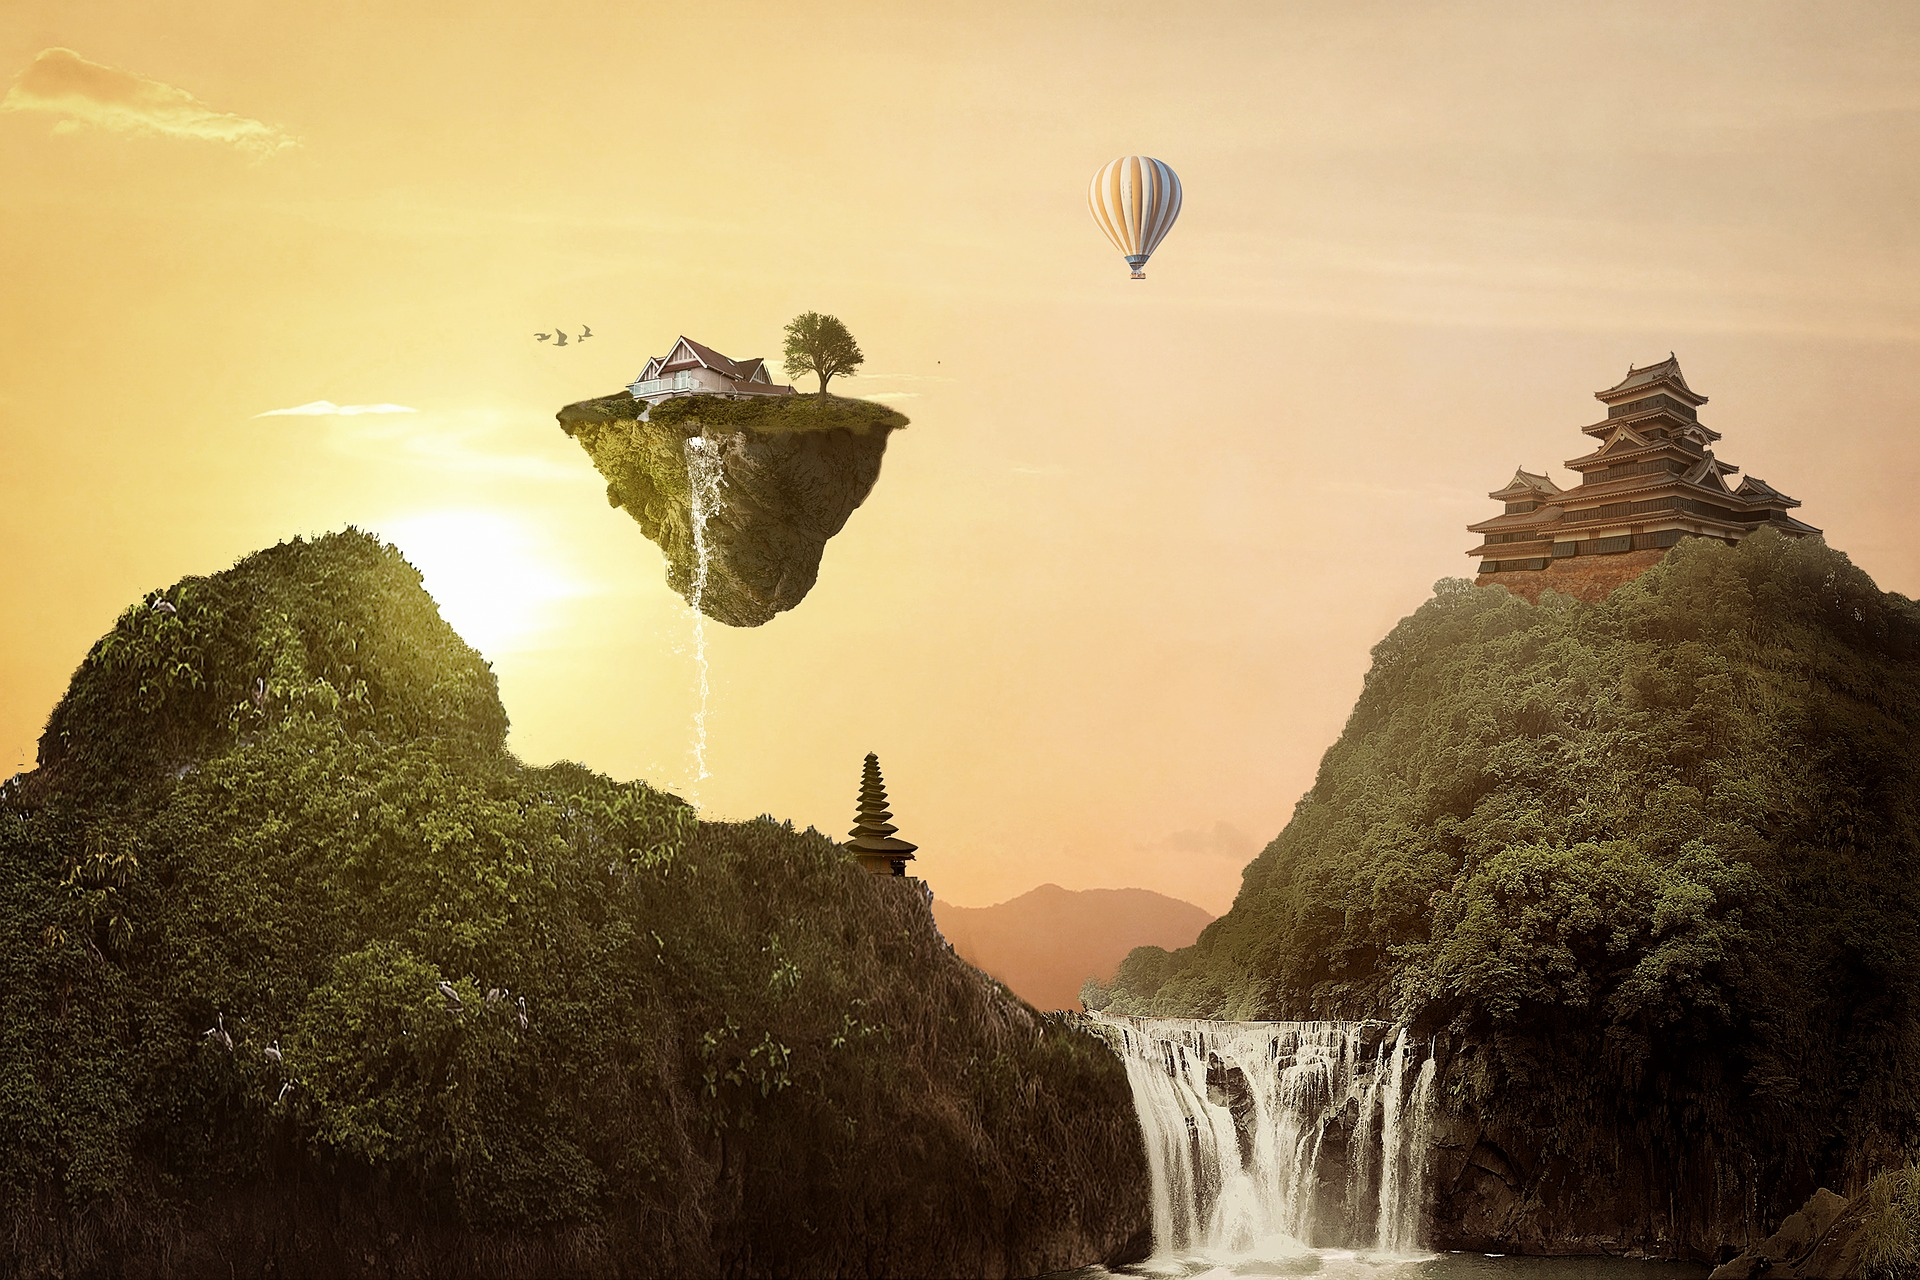 Illustration of fantasy landscape with floating house